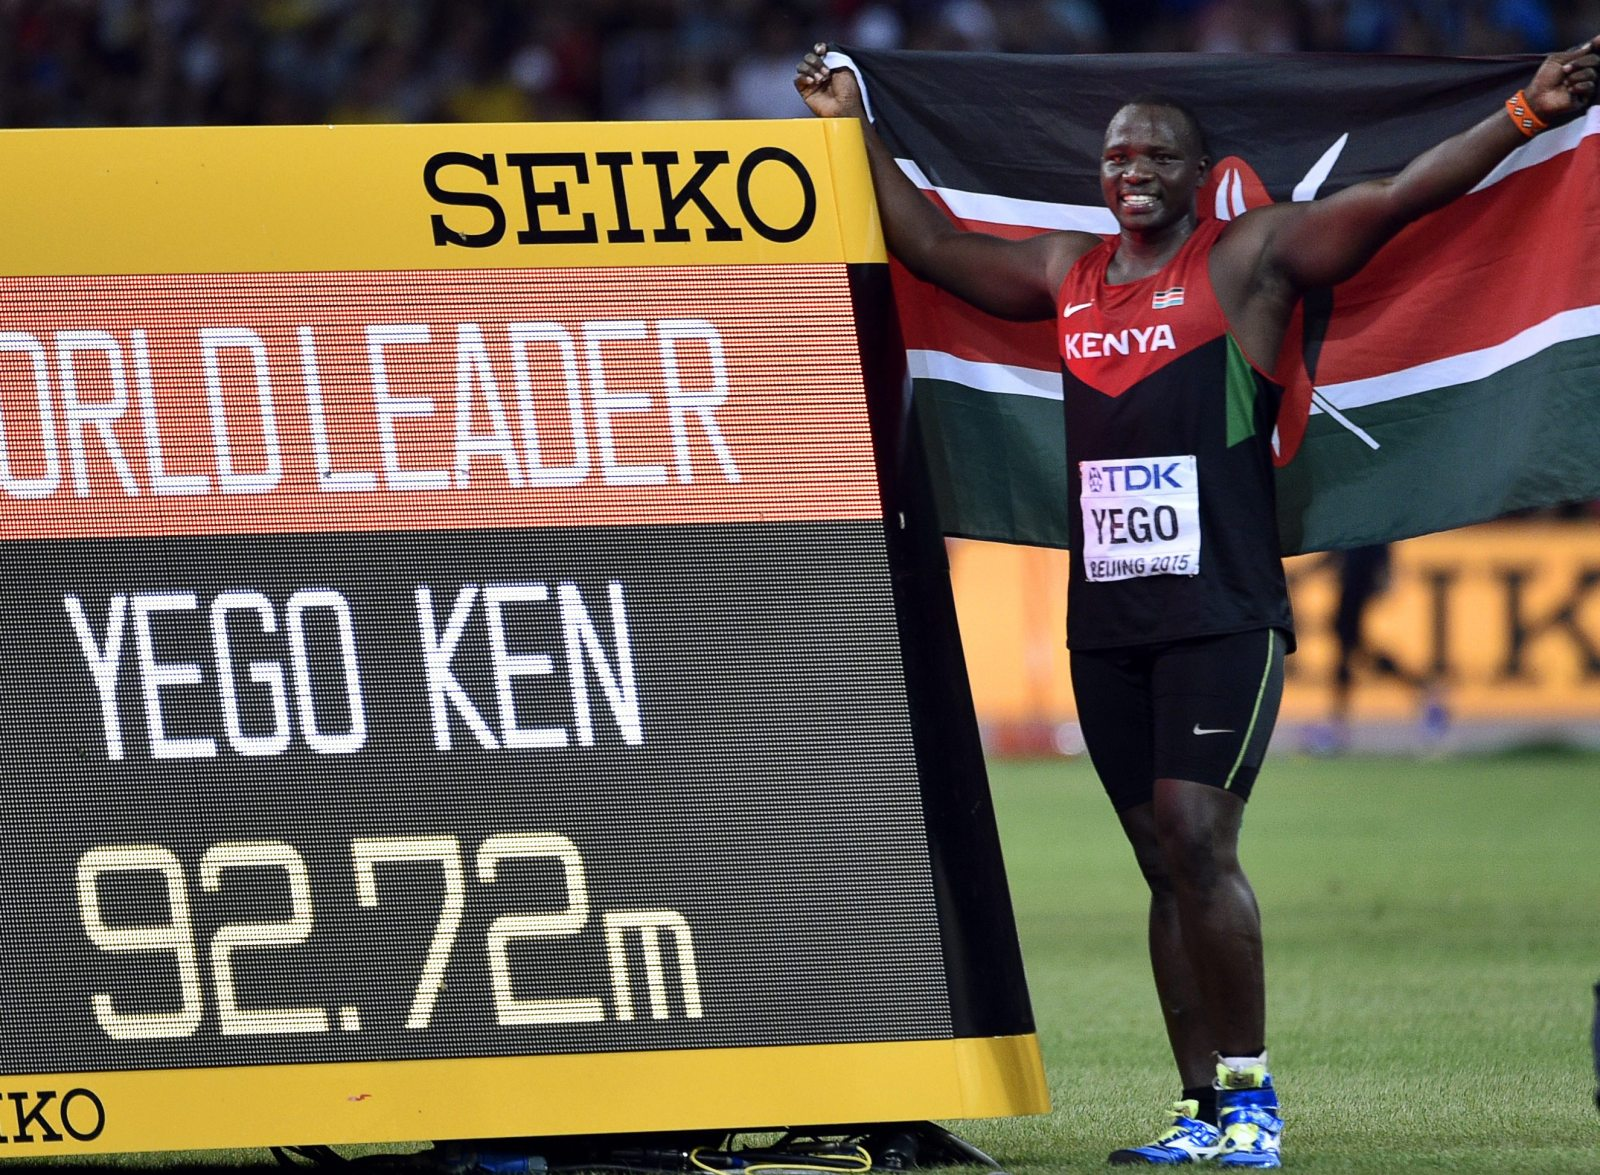 SP atletika: Fenomenalni Van Niekerk i Yego